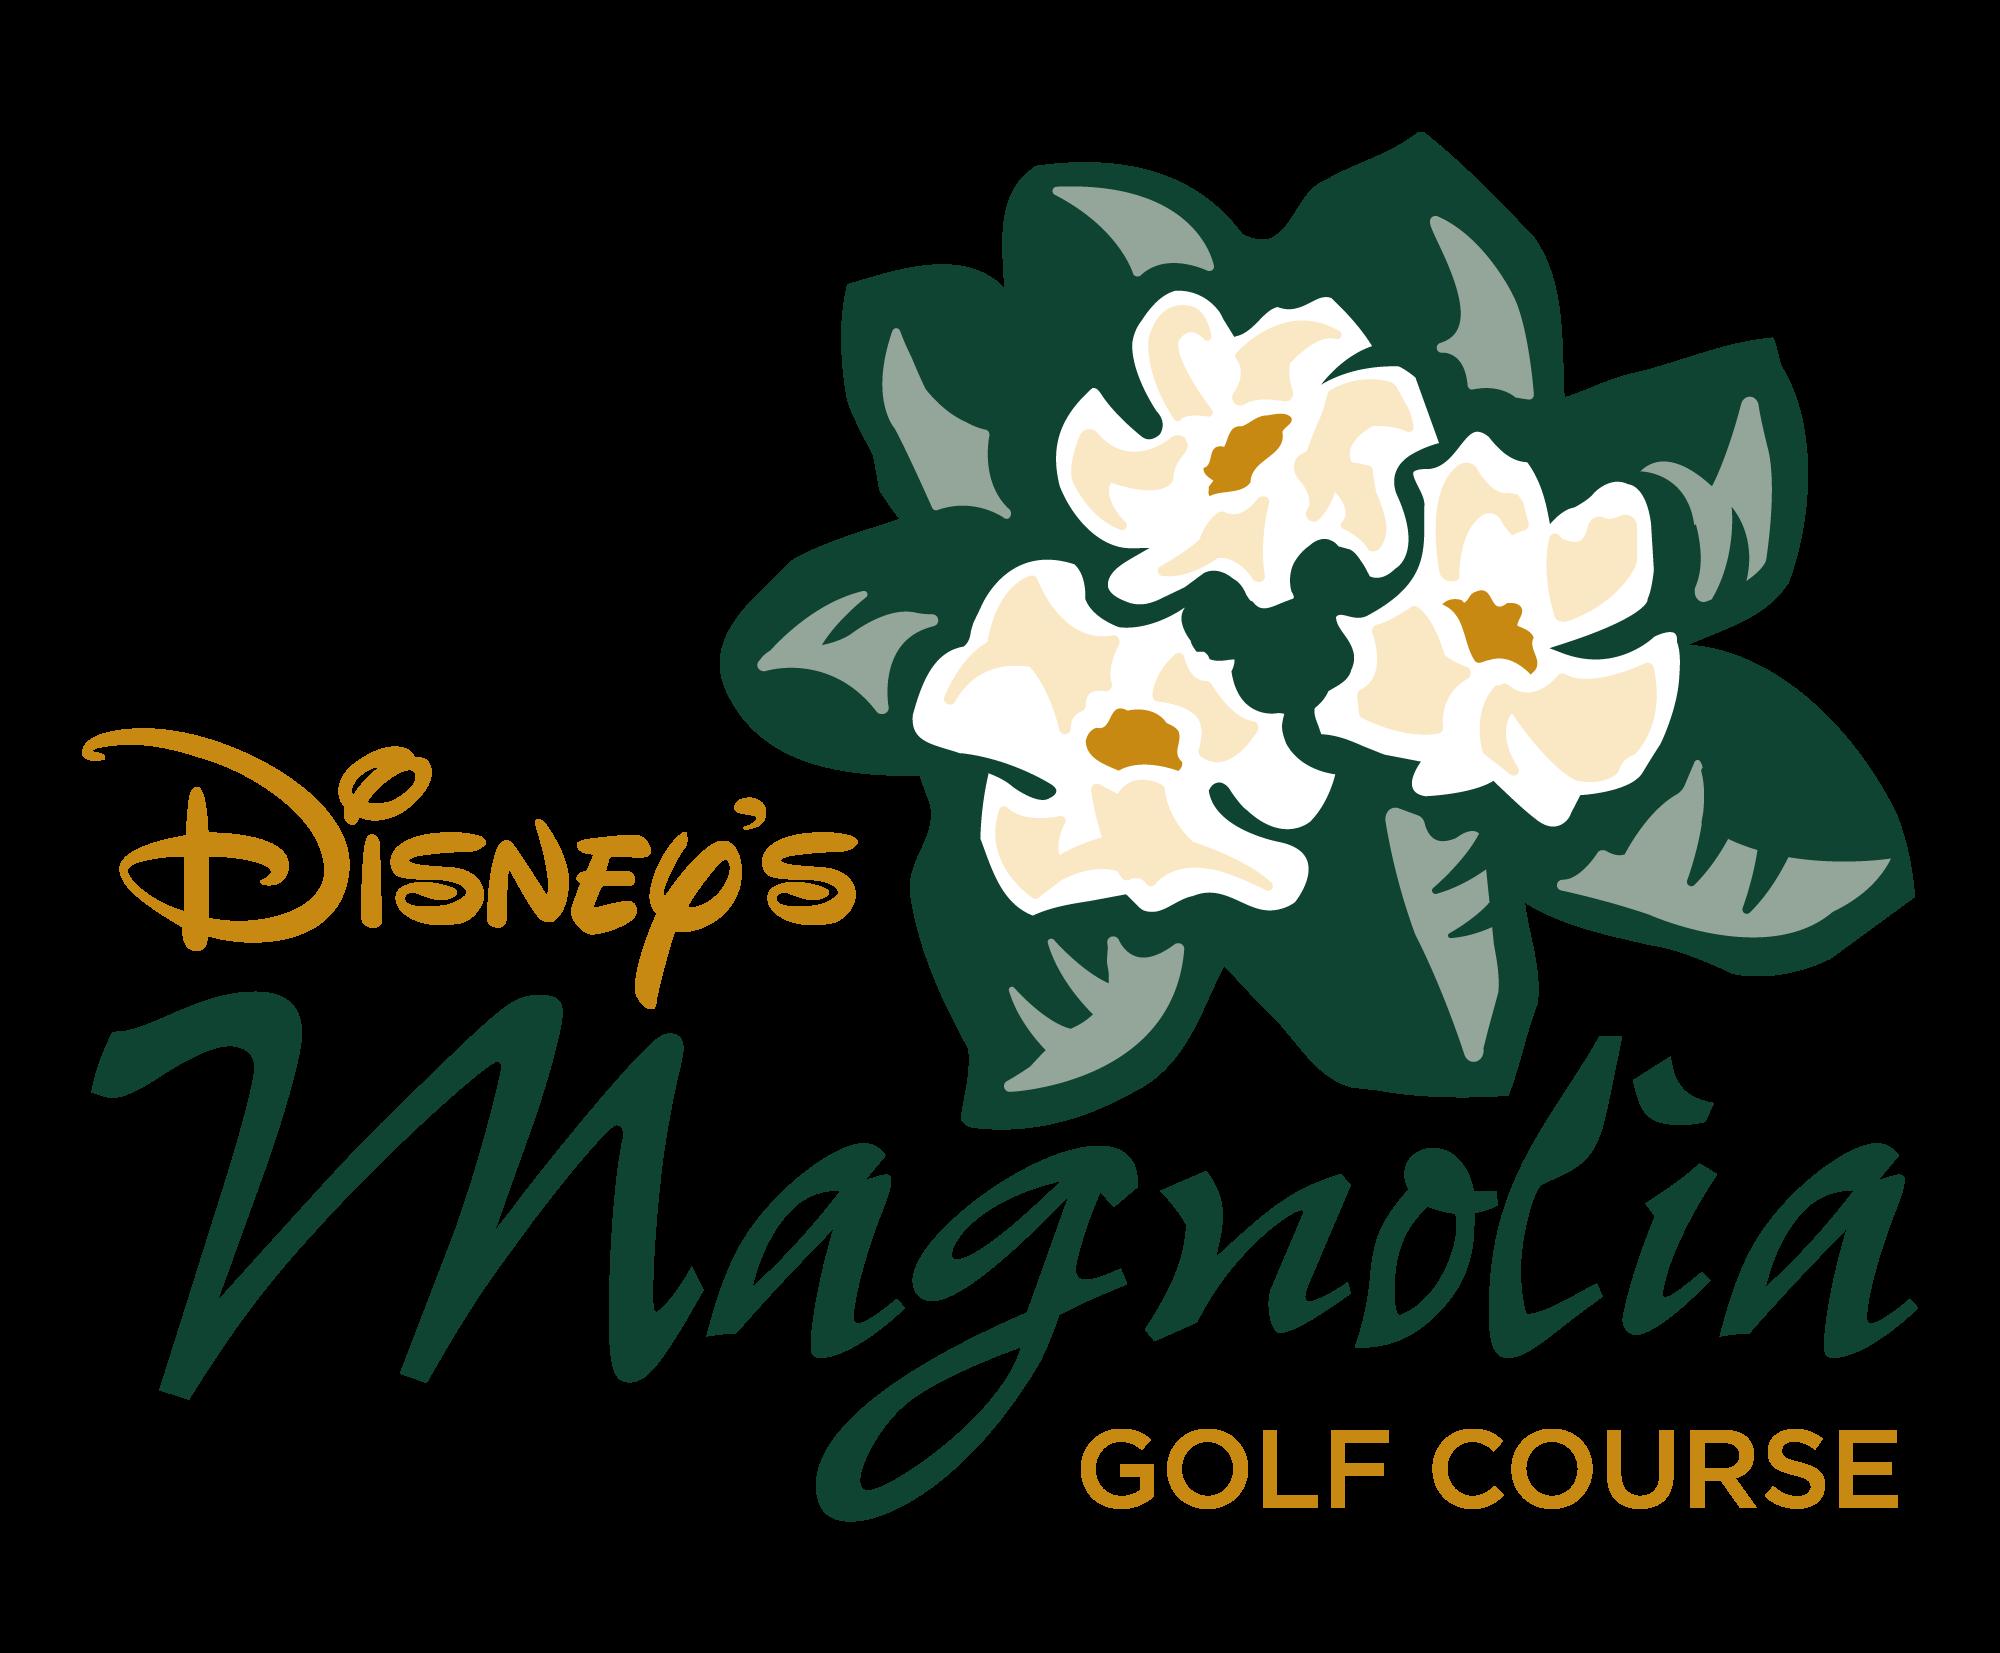 disney golf magnolia logo